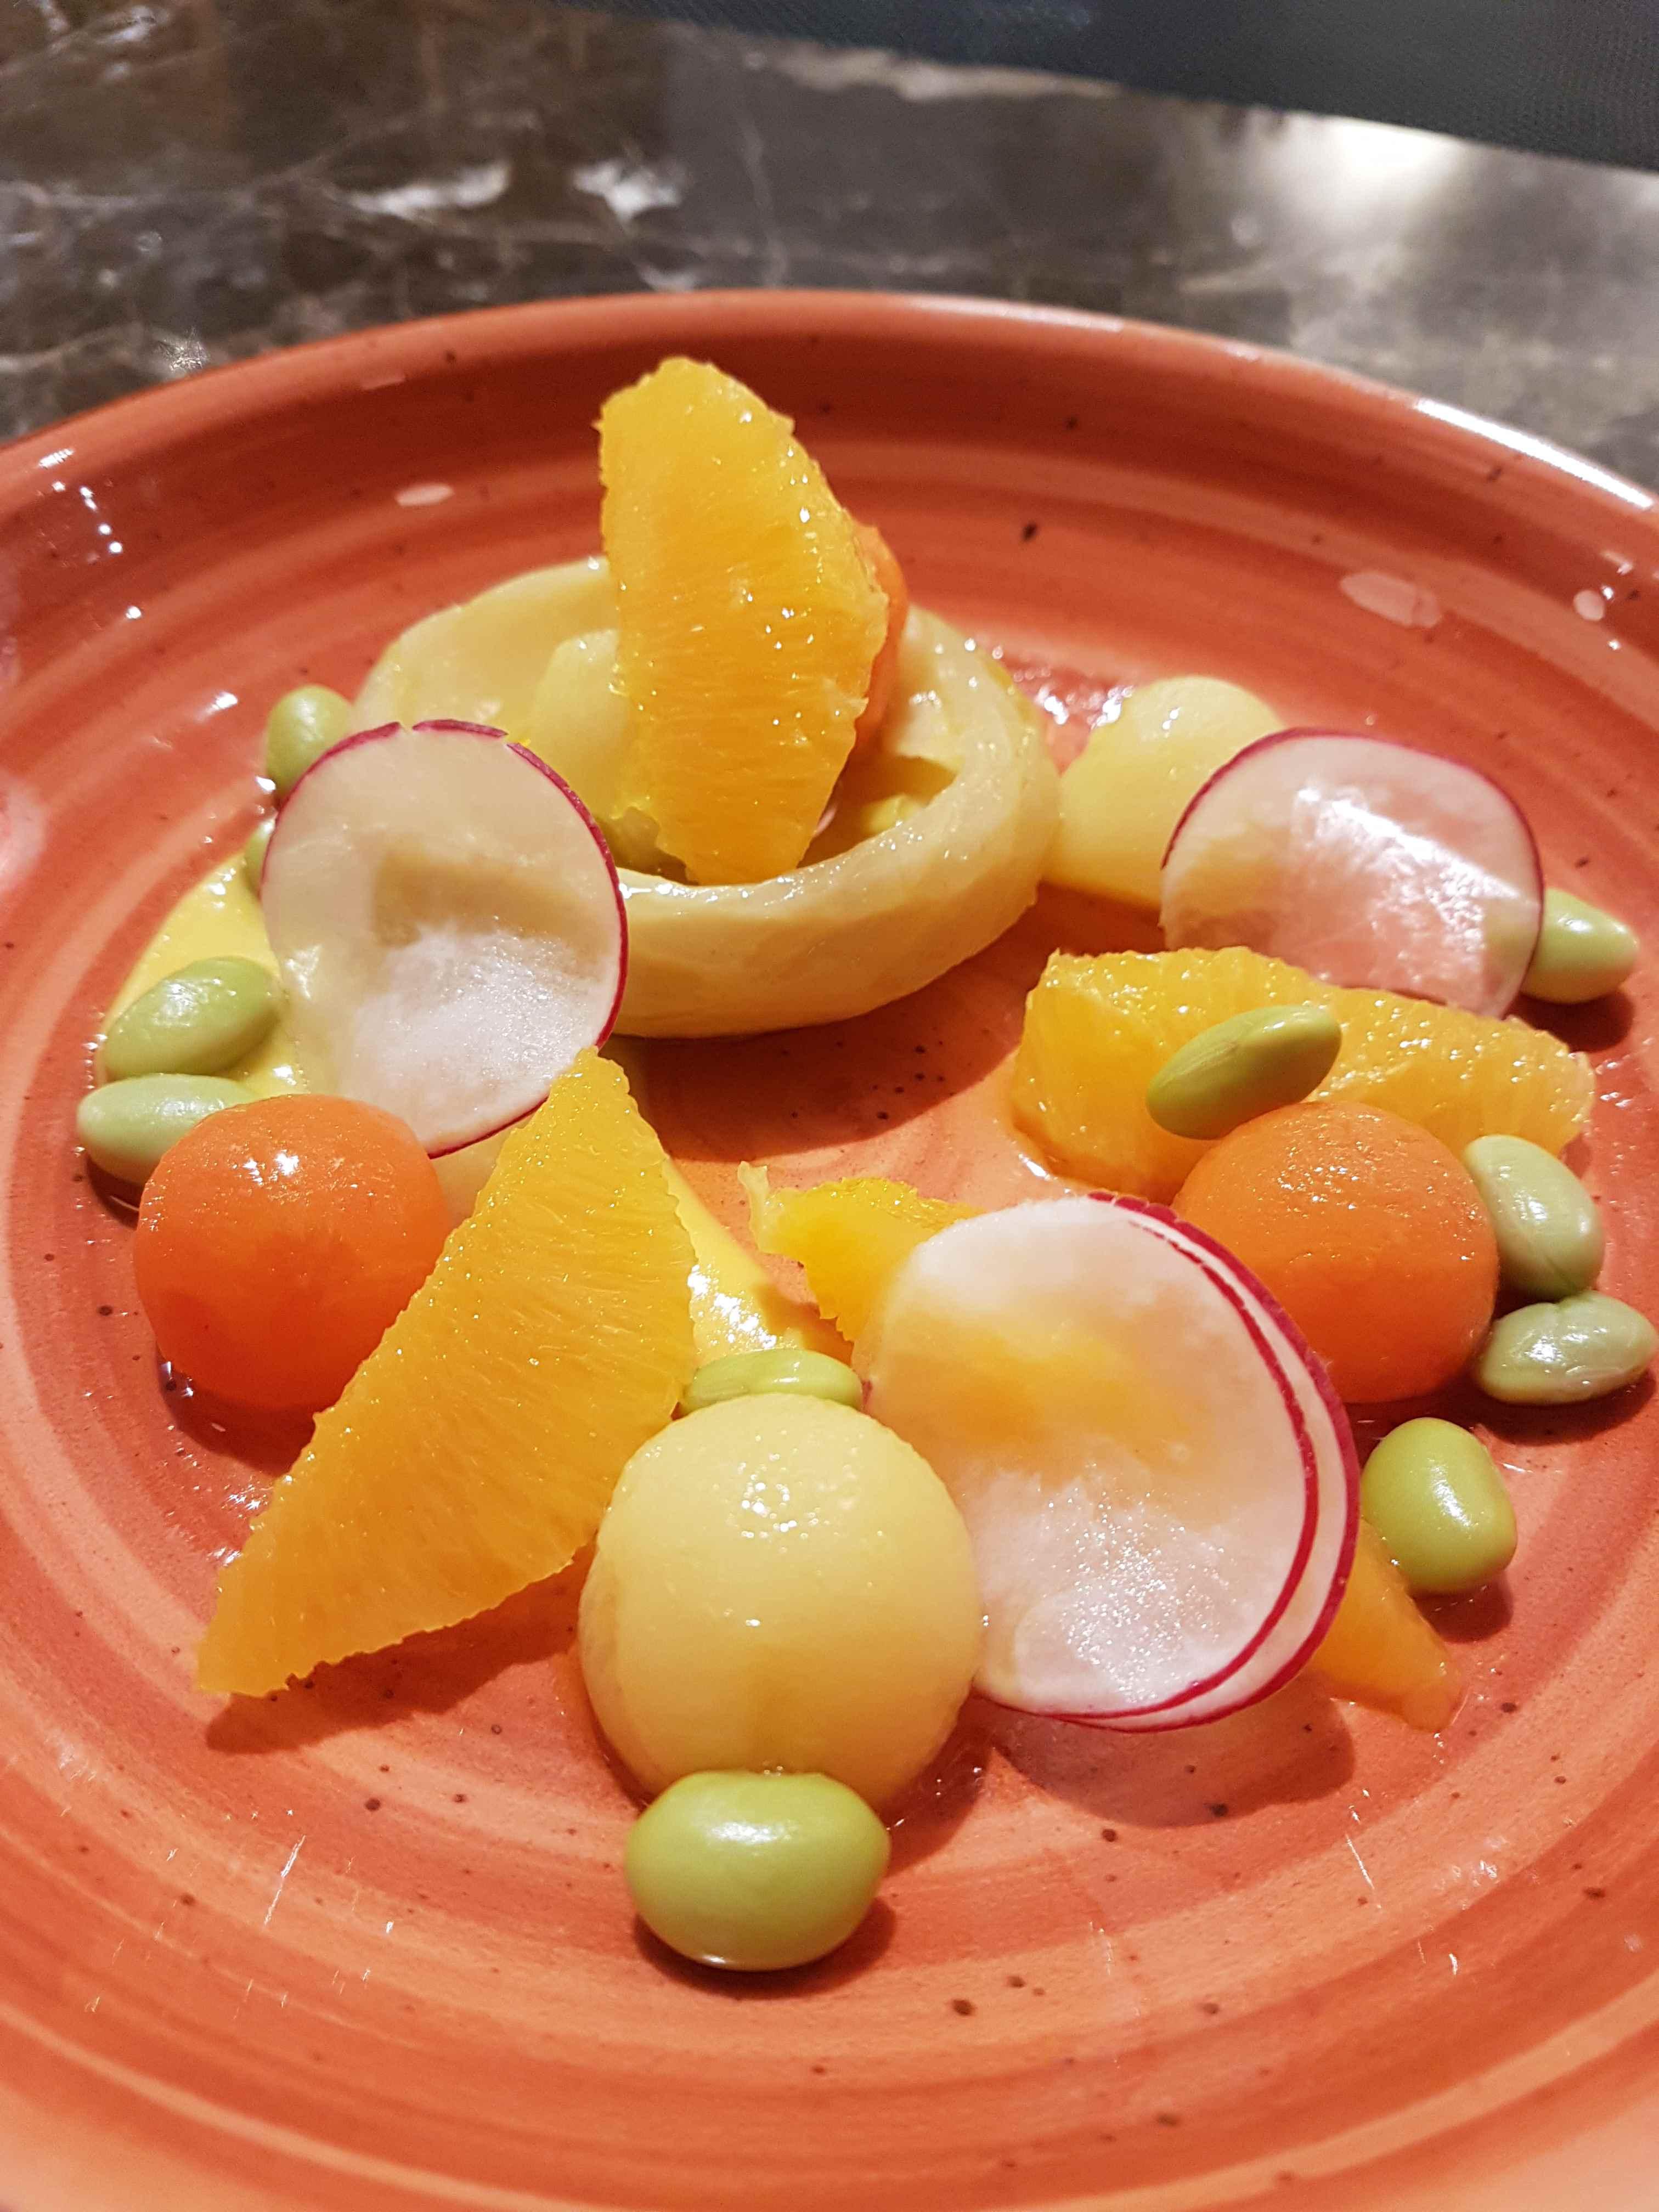 yesempatik-borgo-kitchen-bar-ortakoy-ulus-yemek-enginar